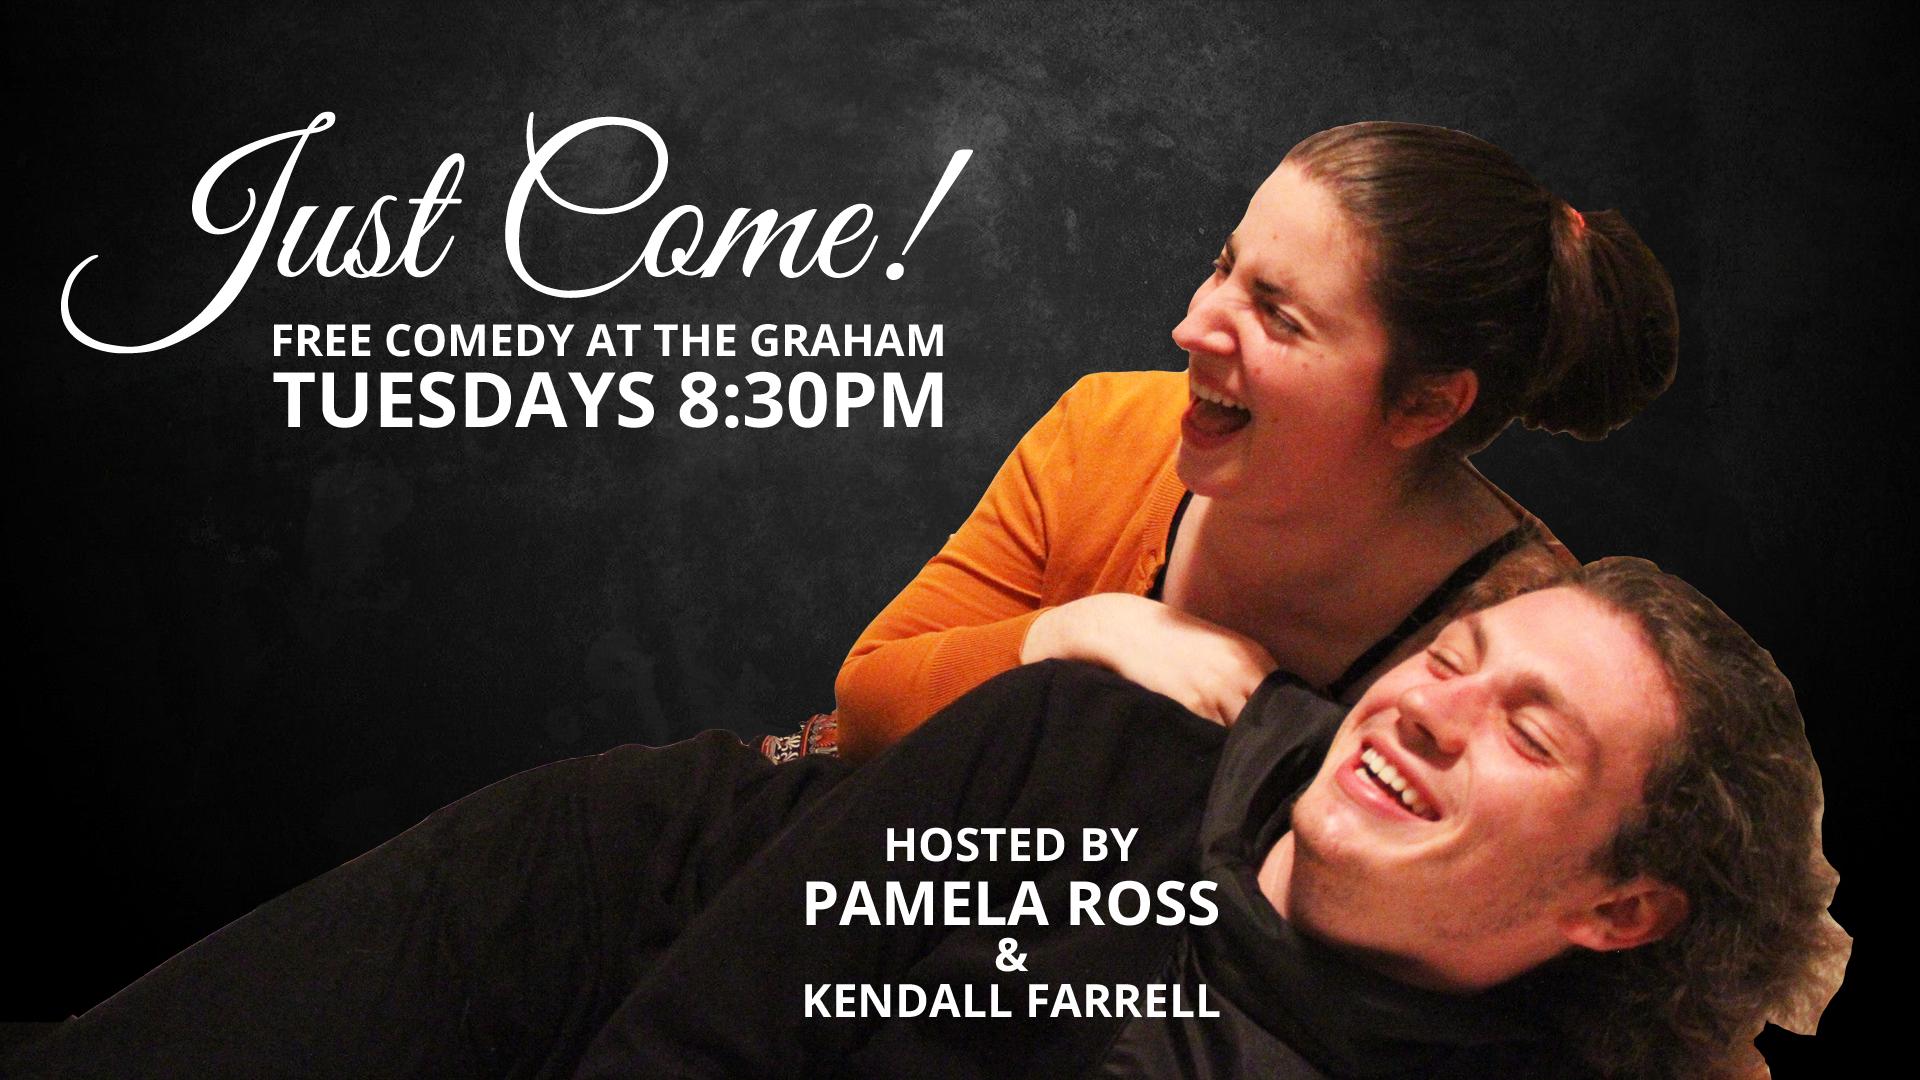 Just Come! Free Comedy in Williamsburg